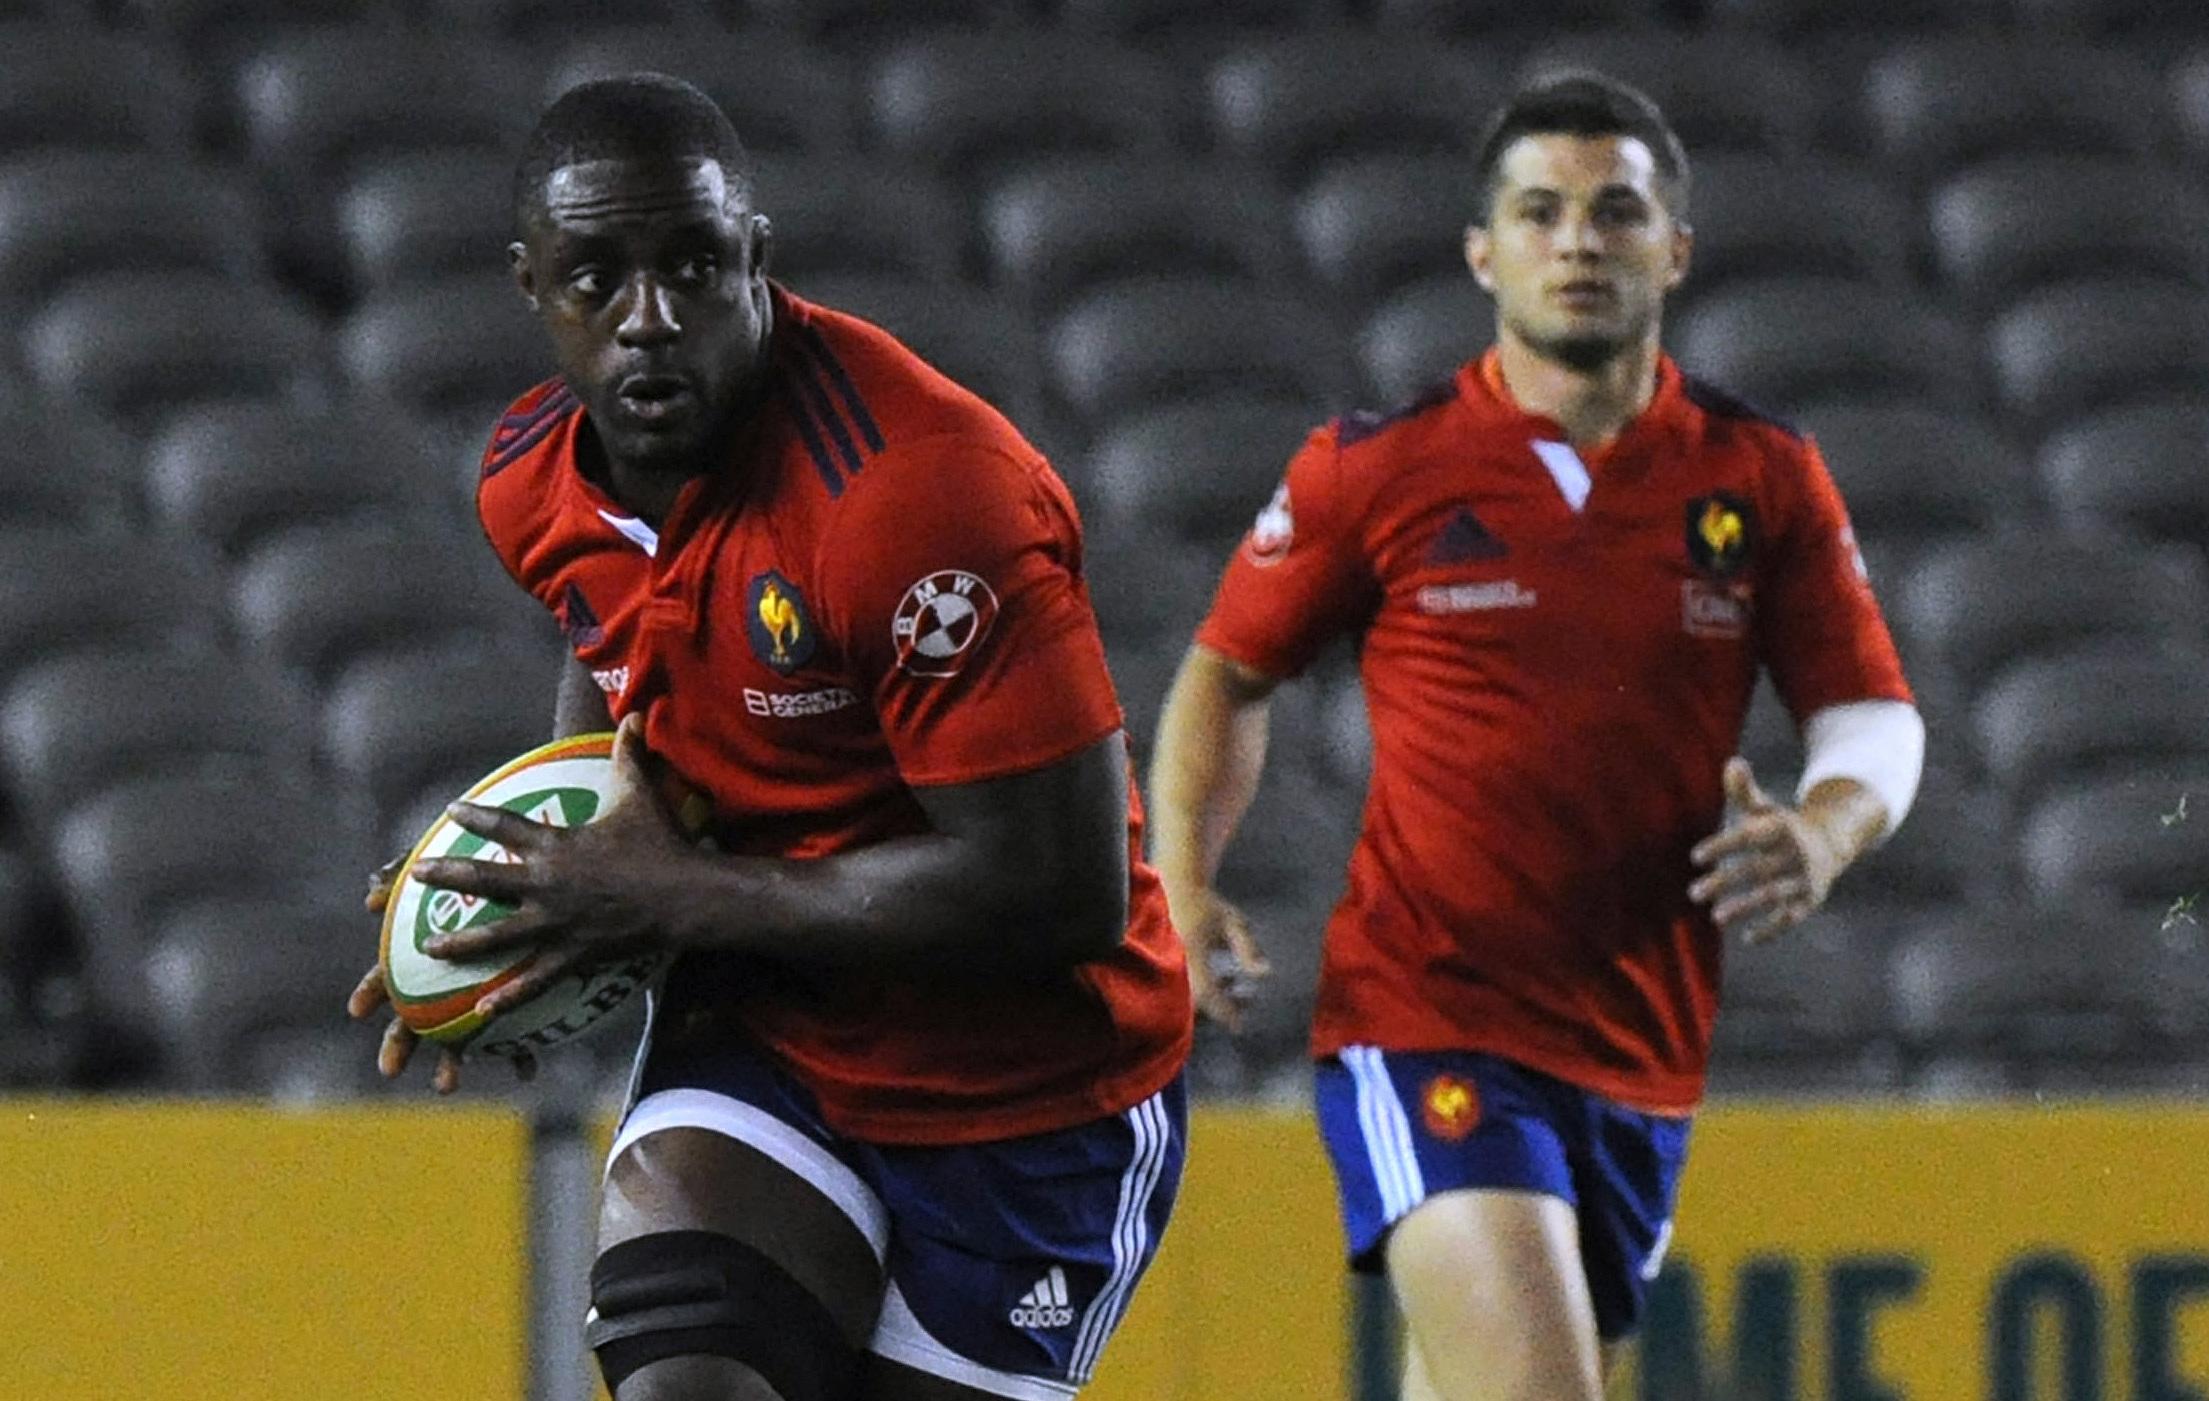 Rugby - Top 14 - Dulin et Nyanga comme Sakho : beaucoup de bruit pour rien ?